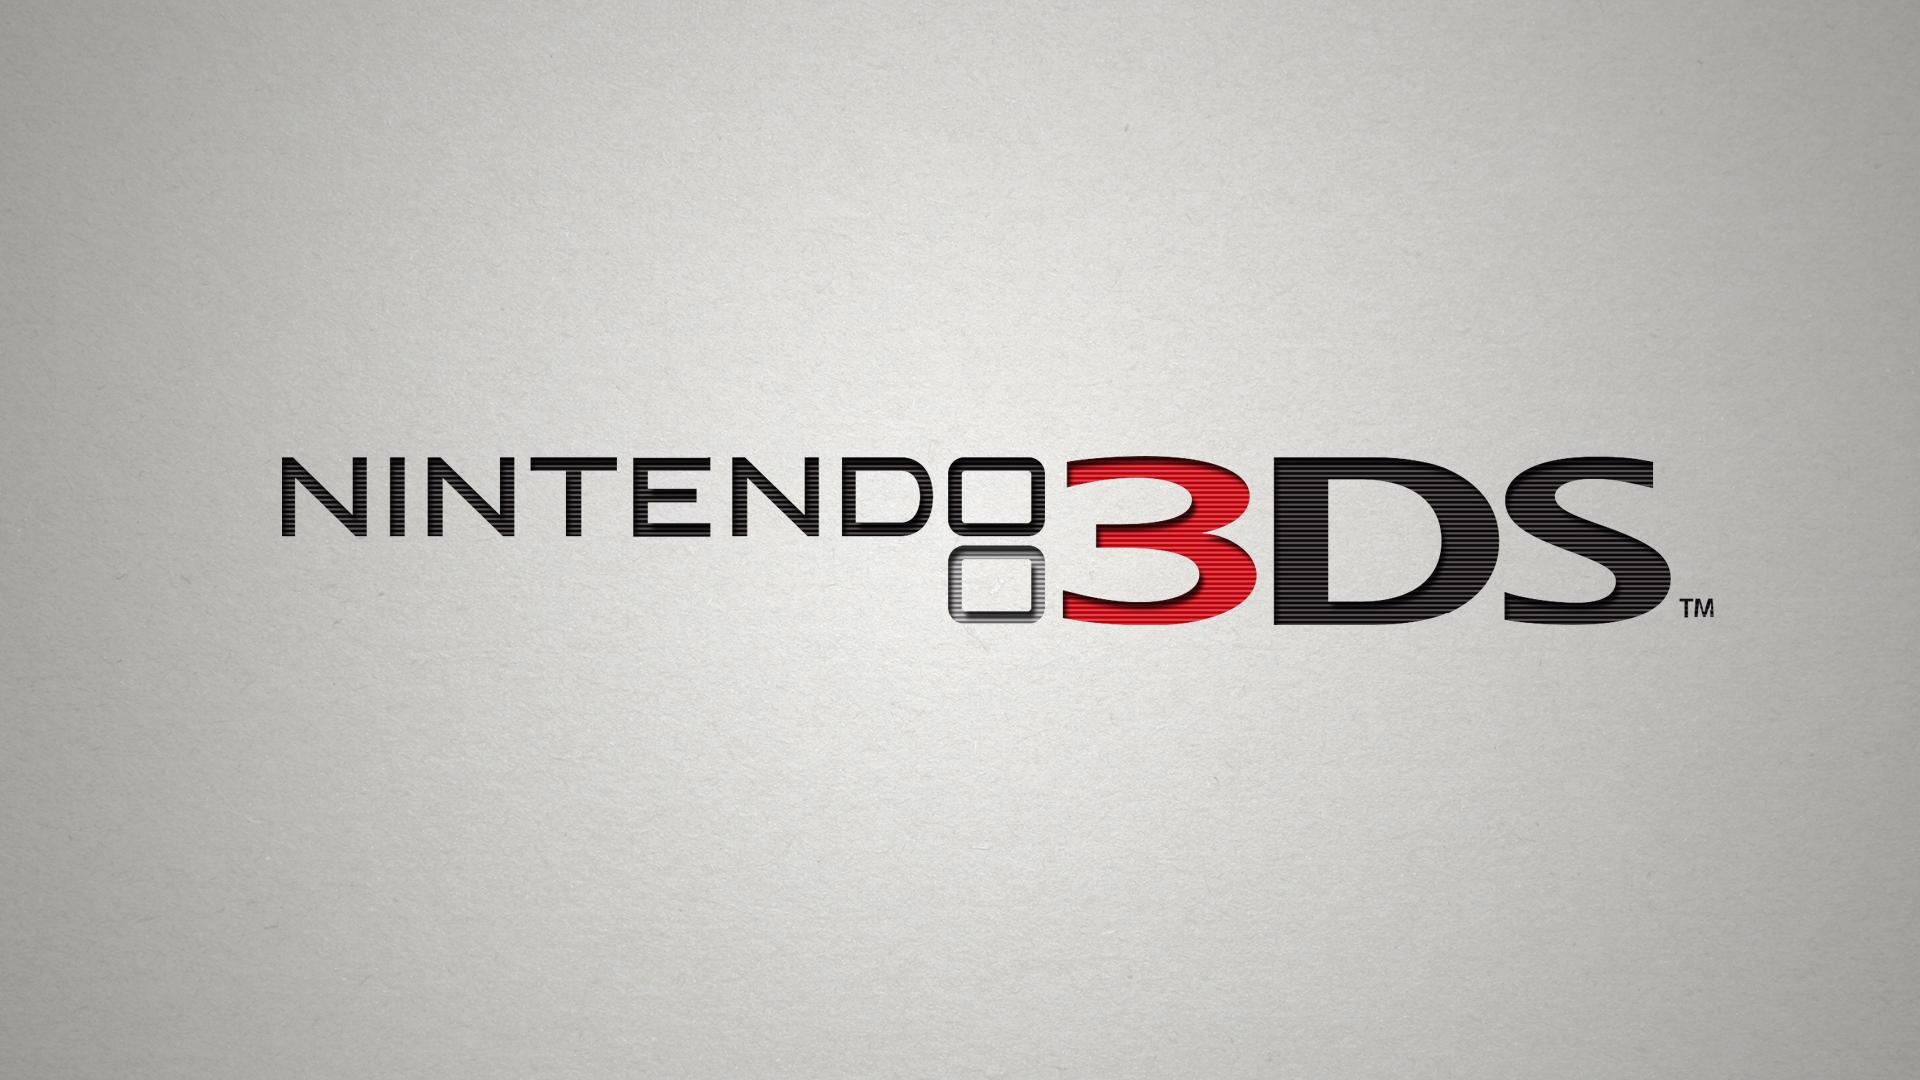 Nintedno 3DS